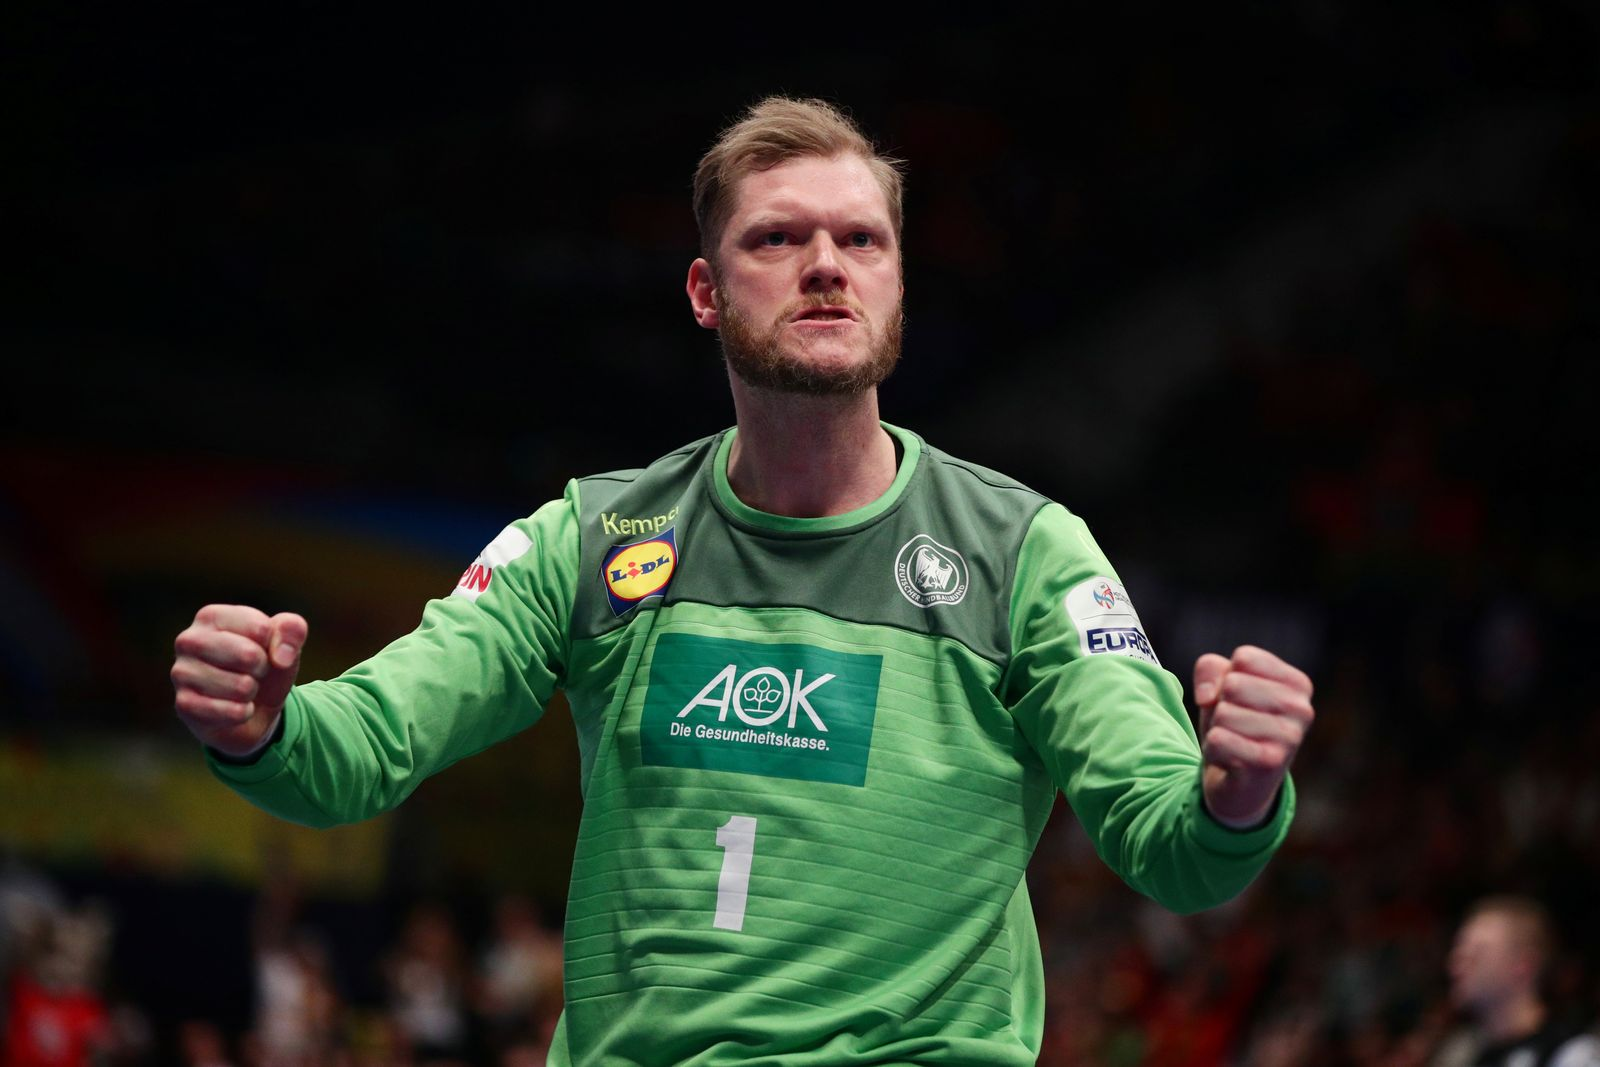 Men's 2020 EHF European Handball Championship - Main Round - Group 1 - Czech Republic v Germany